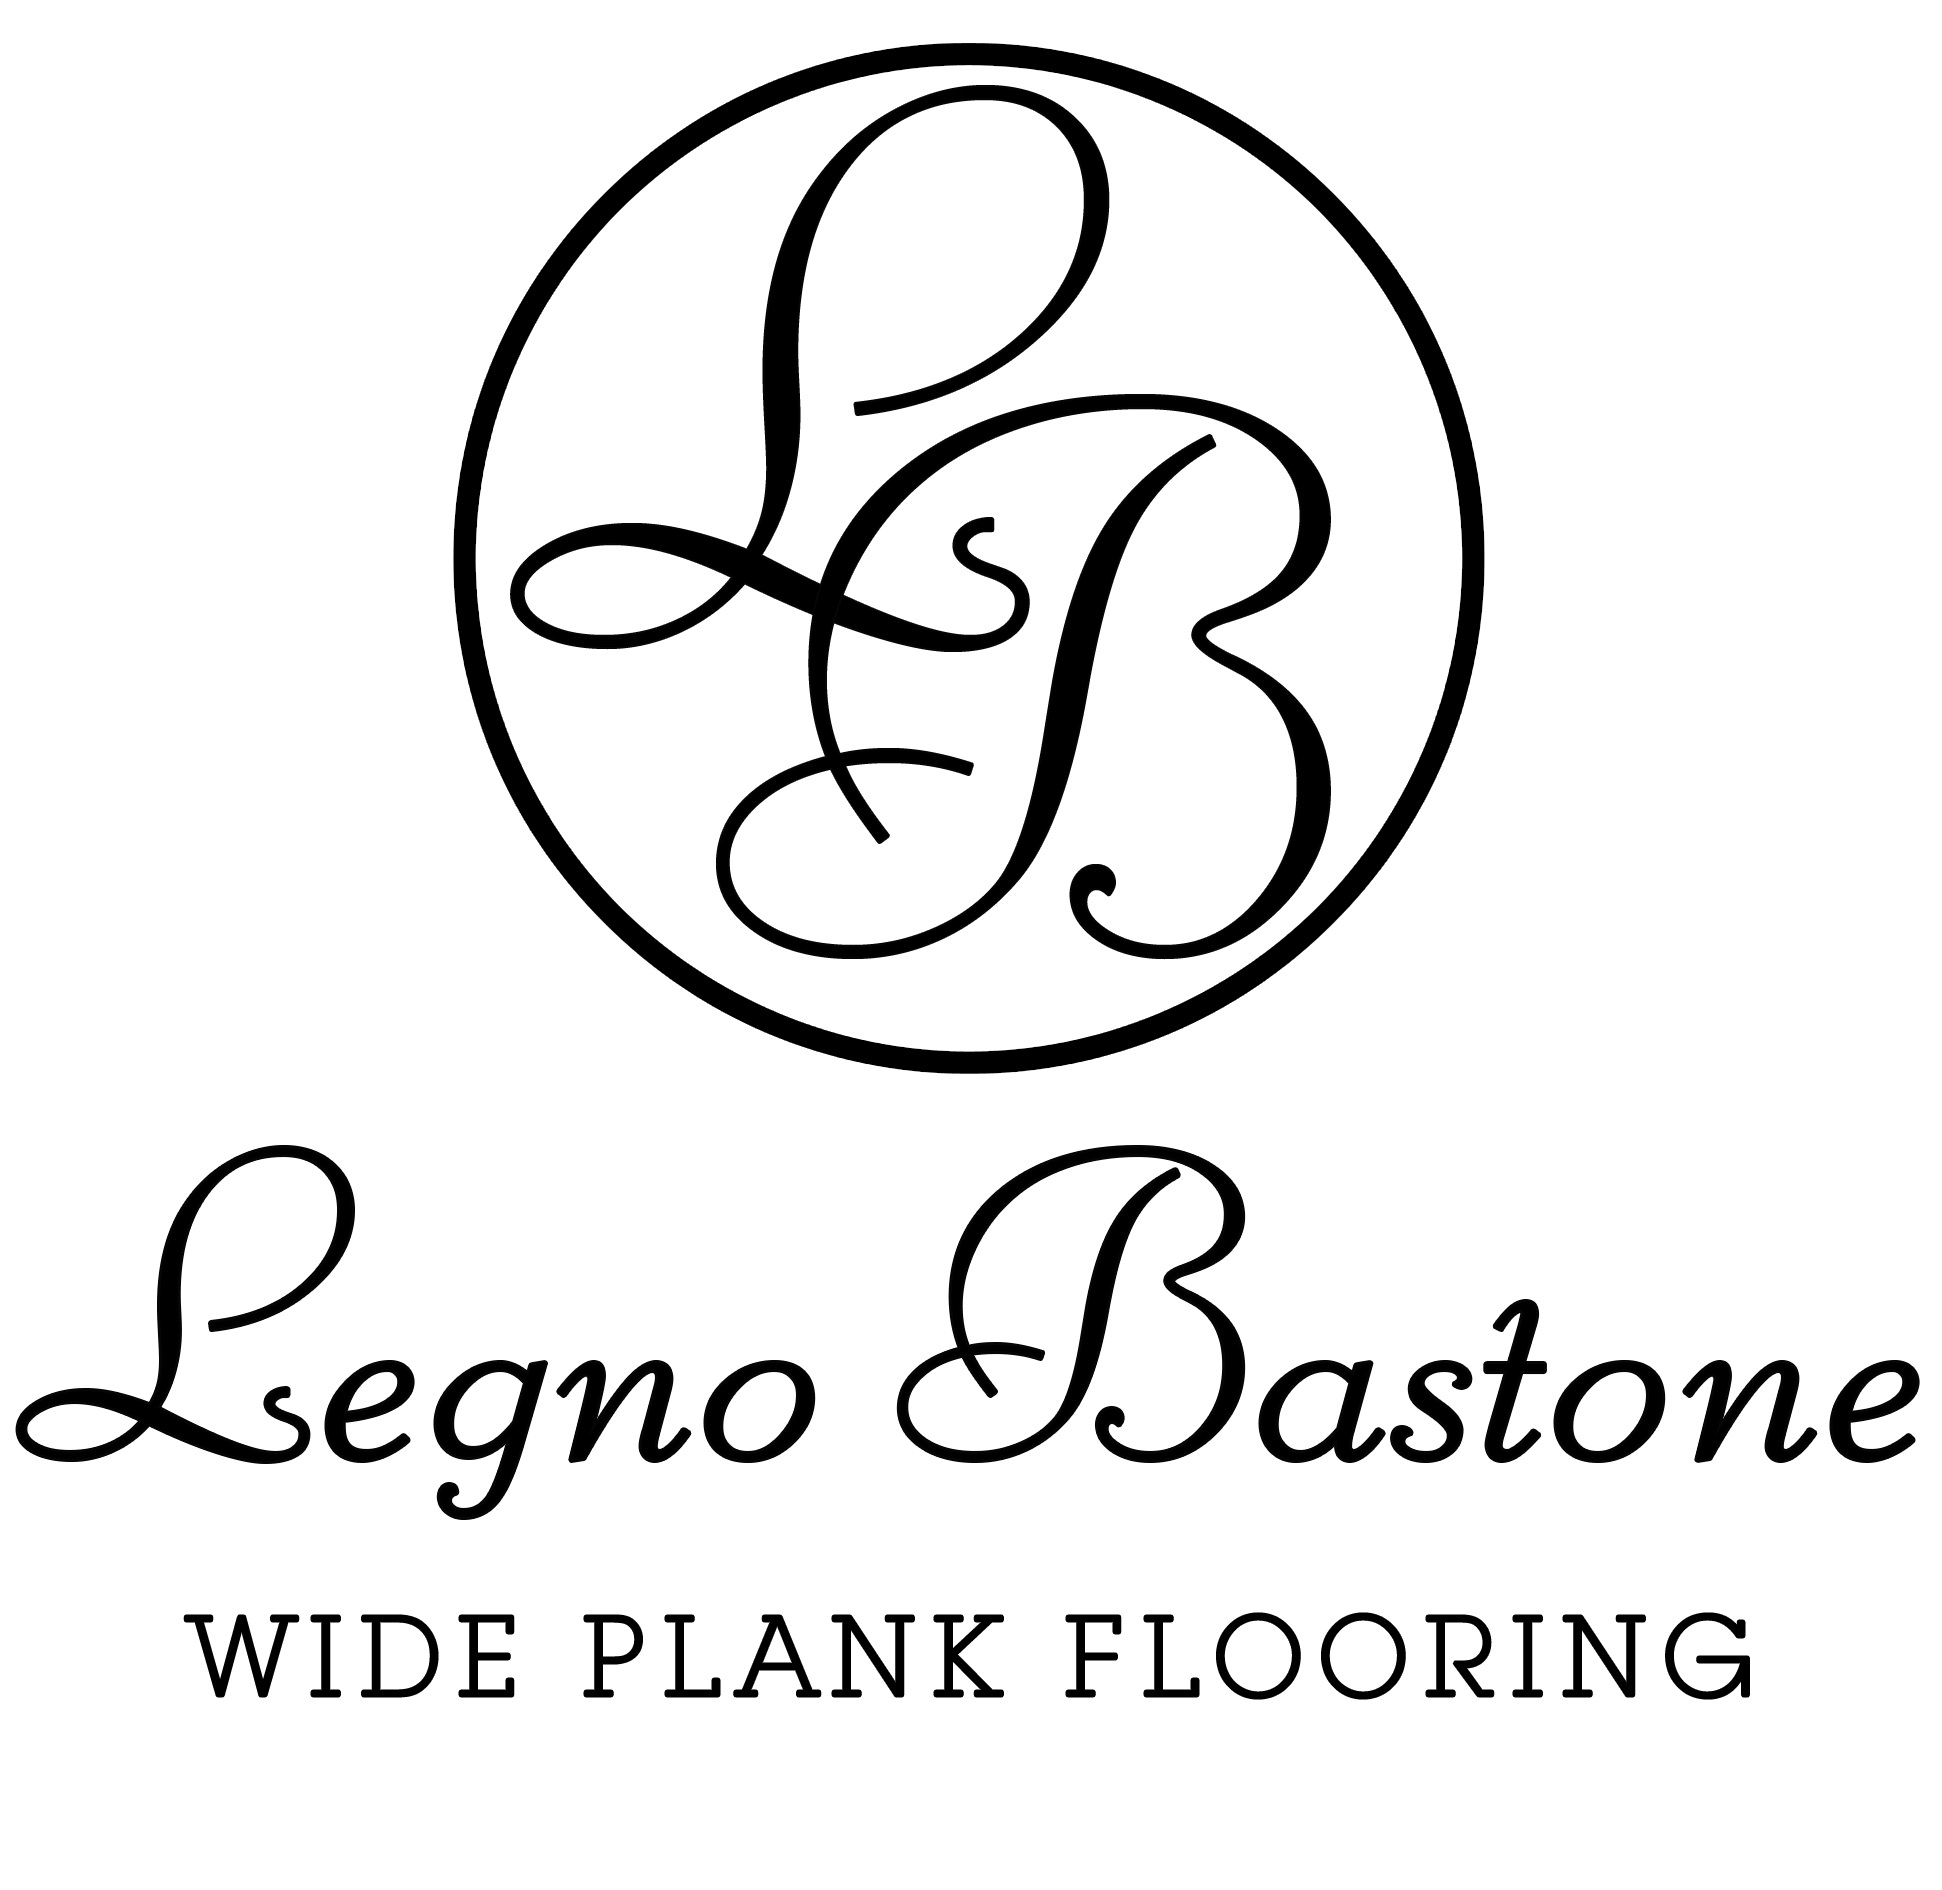 Naples Flooring Company is now a Legno Bastone Authorized Dealer